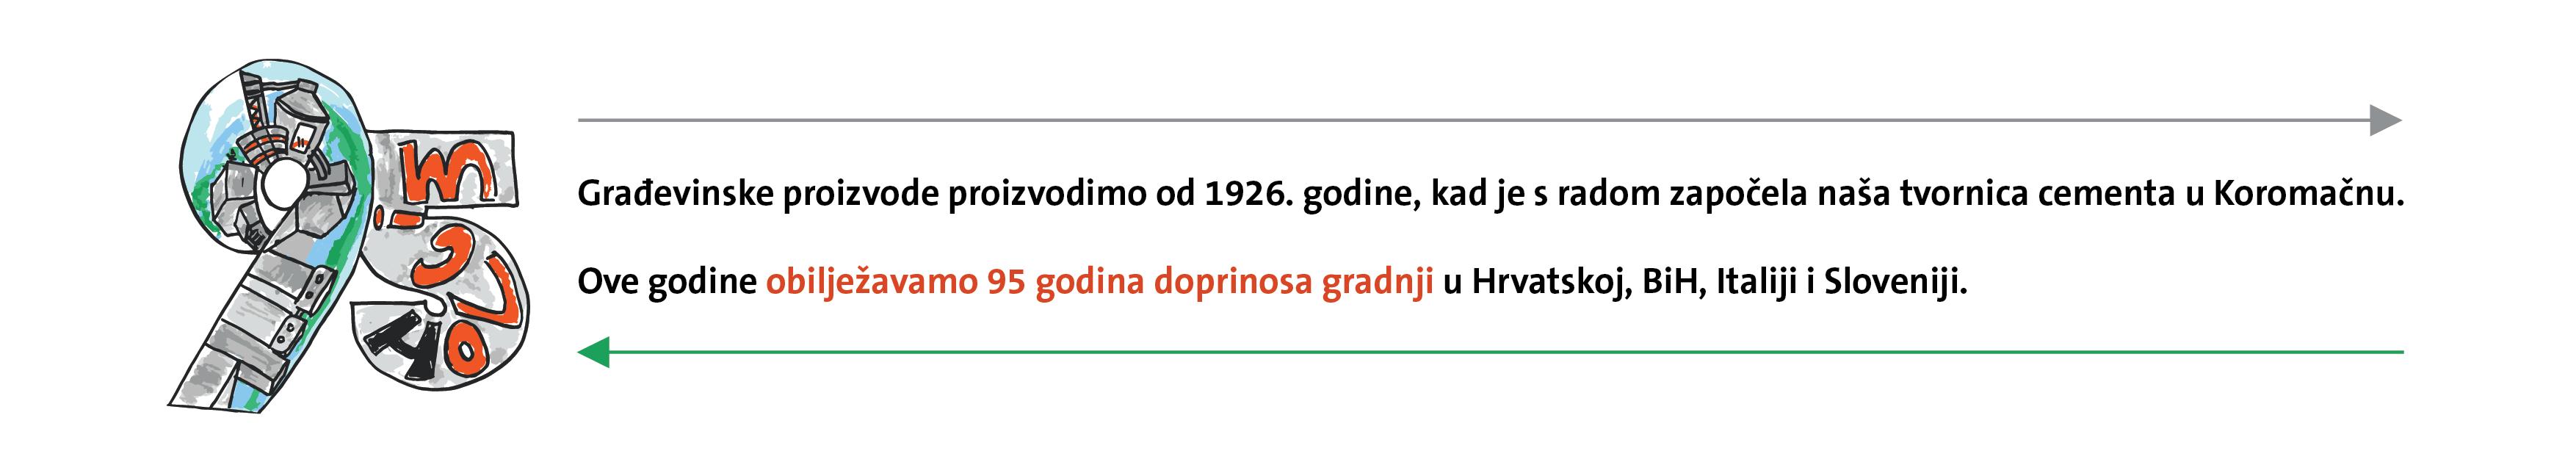 95 godina holcim hrvatska velika